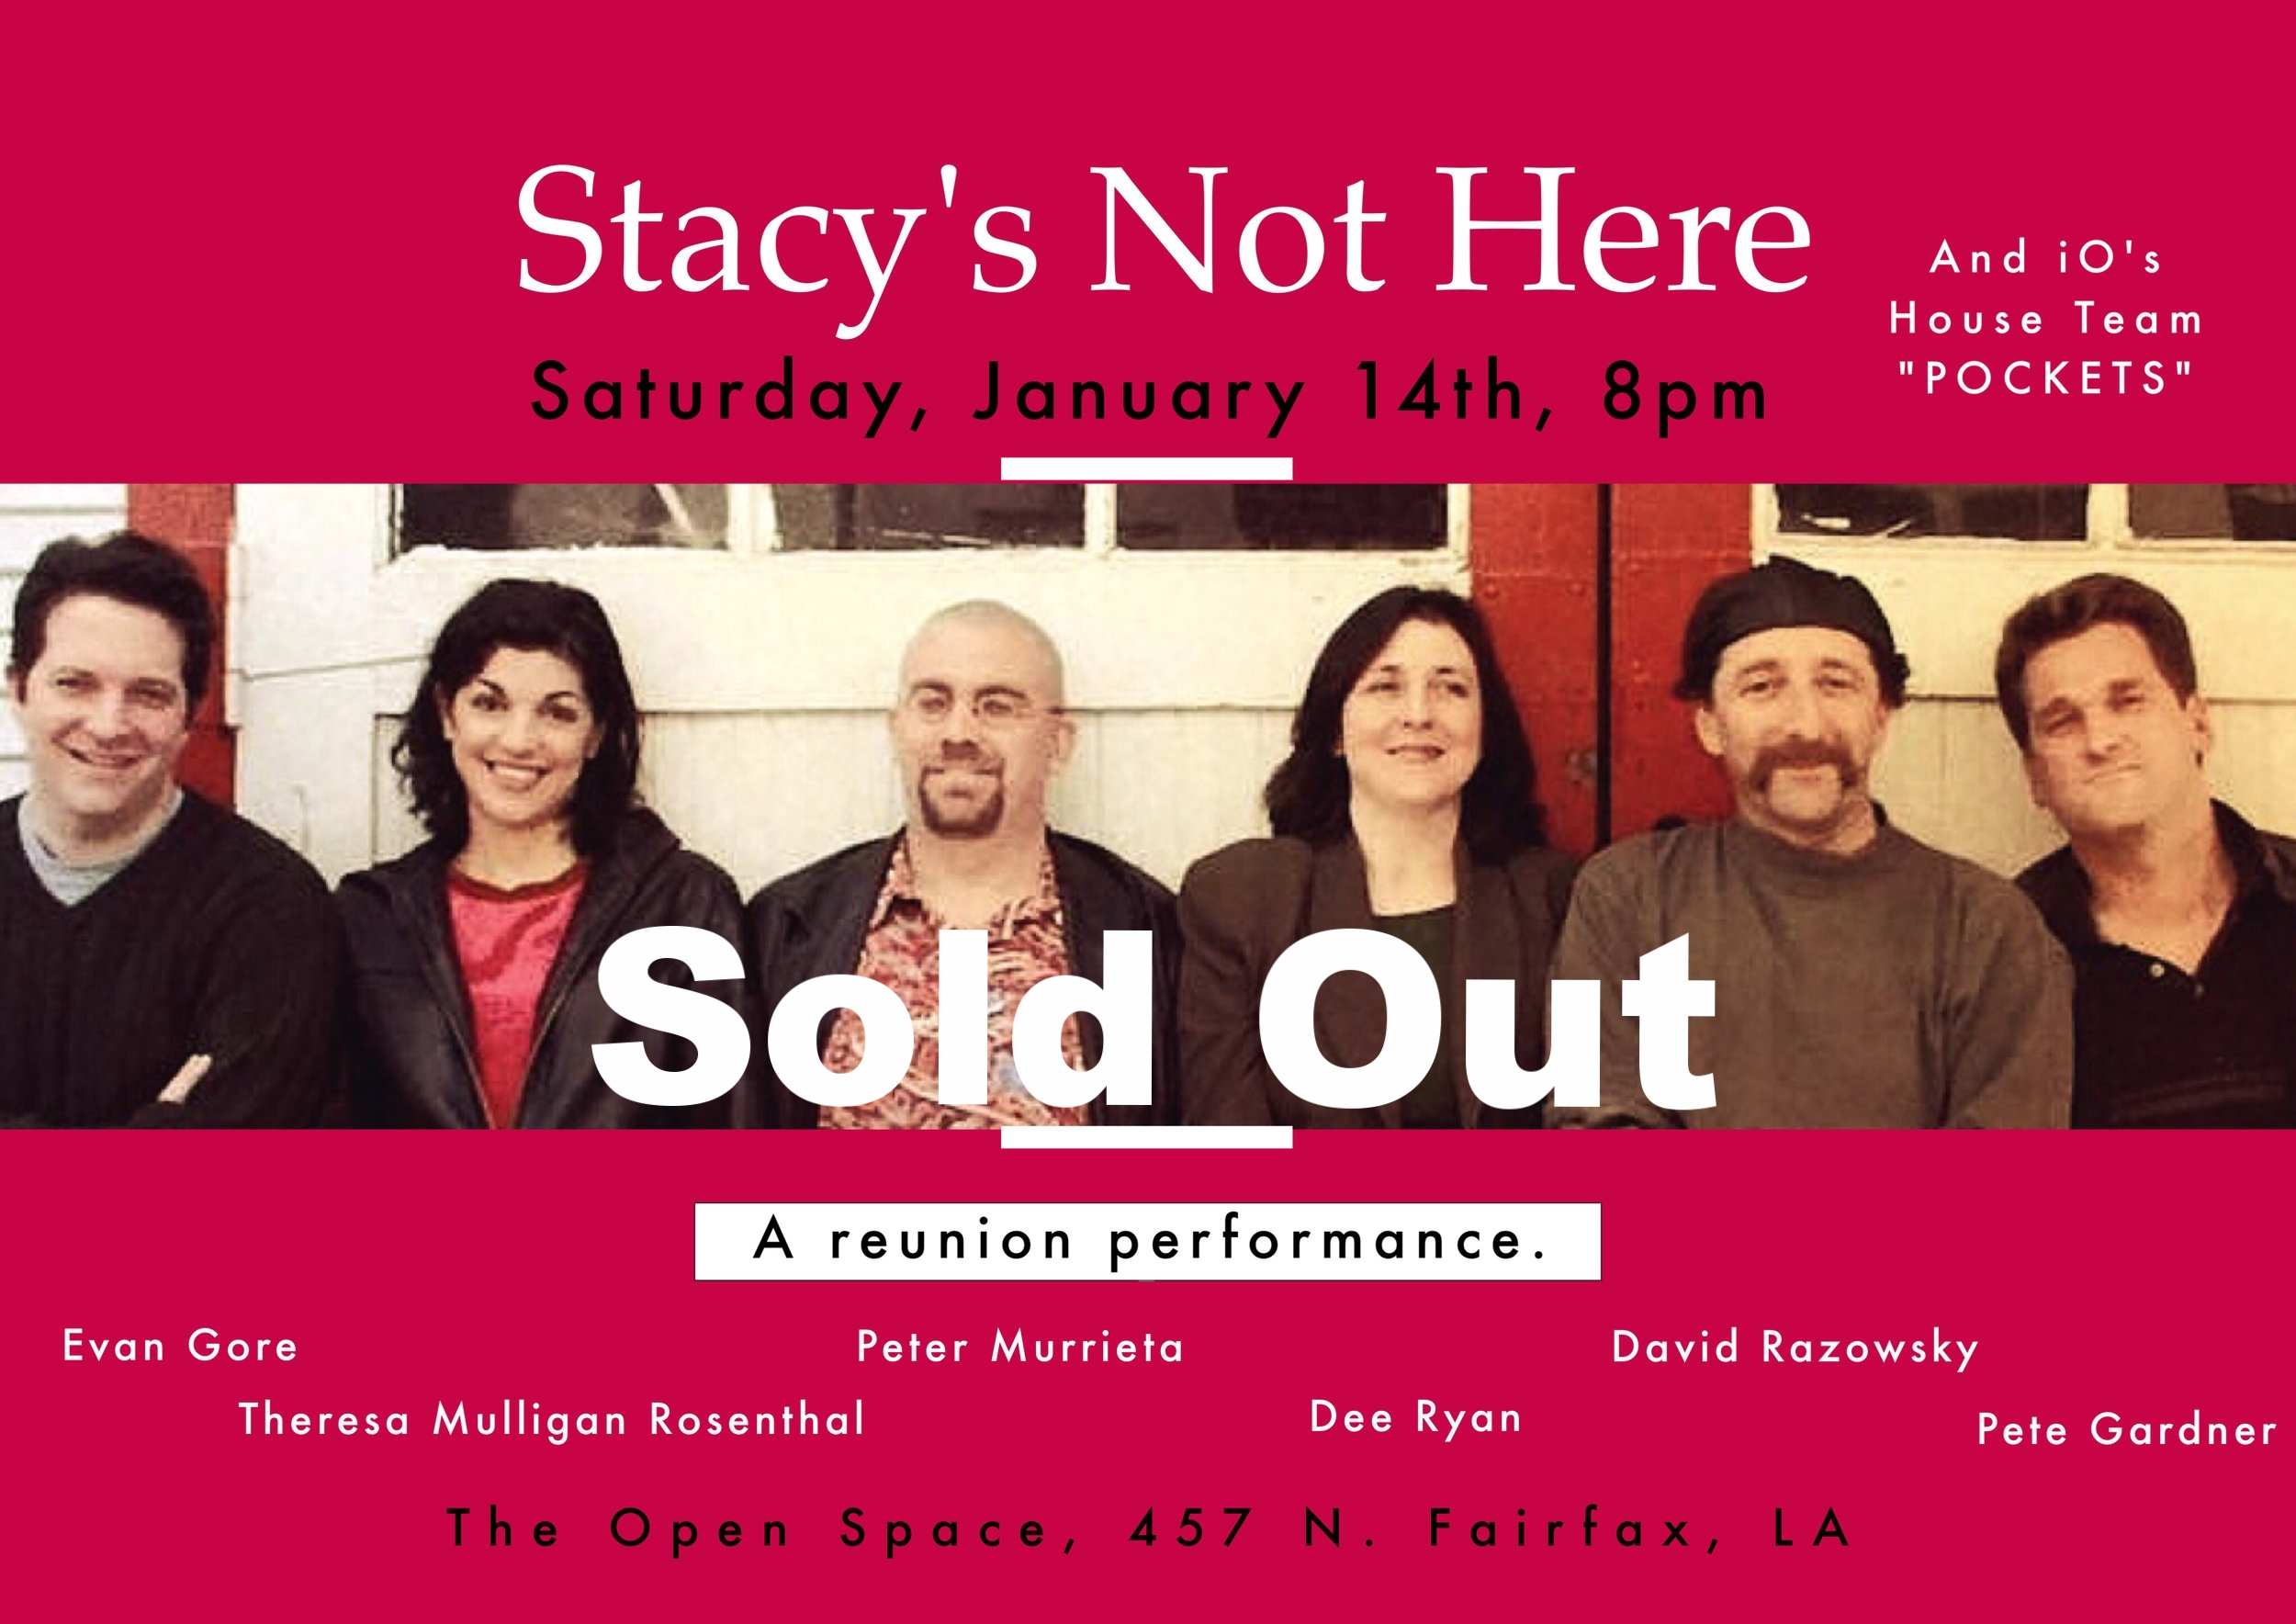 Stacy's Not Here: Evan Gore, Theresa Mulligan Rosenthal, Peter Murrieta, Dee Ryan, David Razowsky, and Pete Gardner.